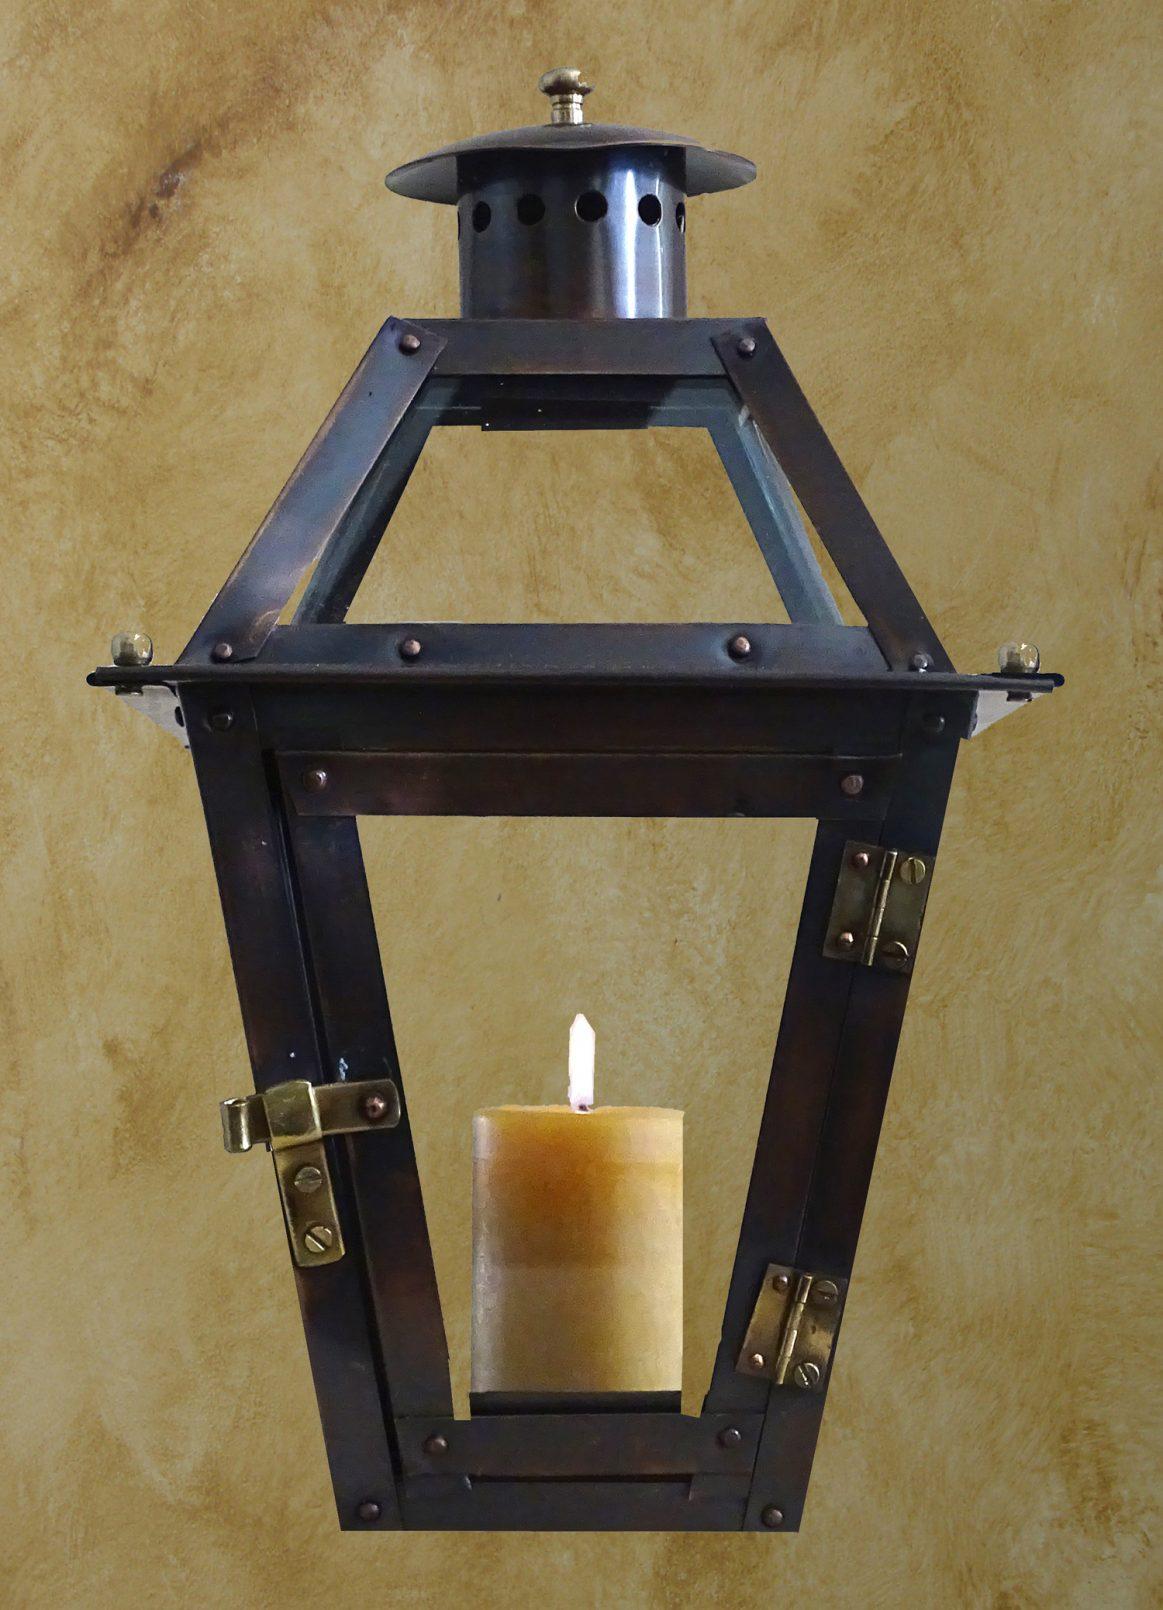 CandleLantern_FQ12_Candle_Background1